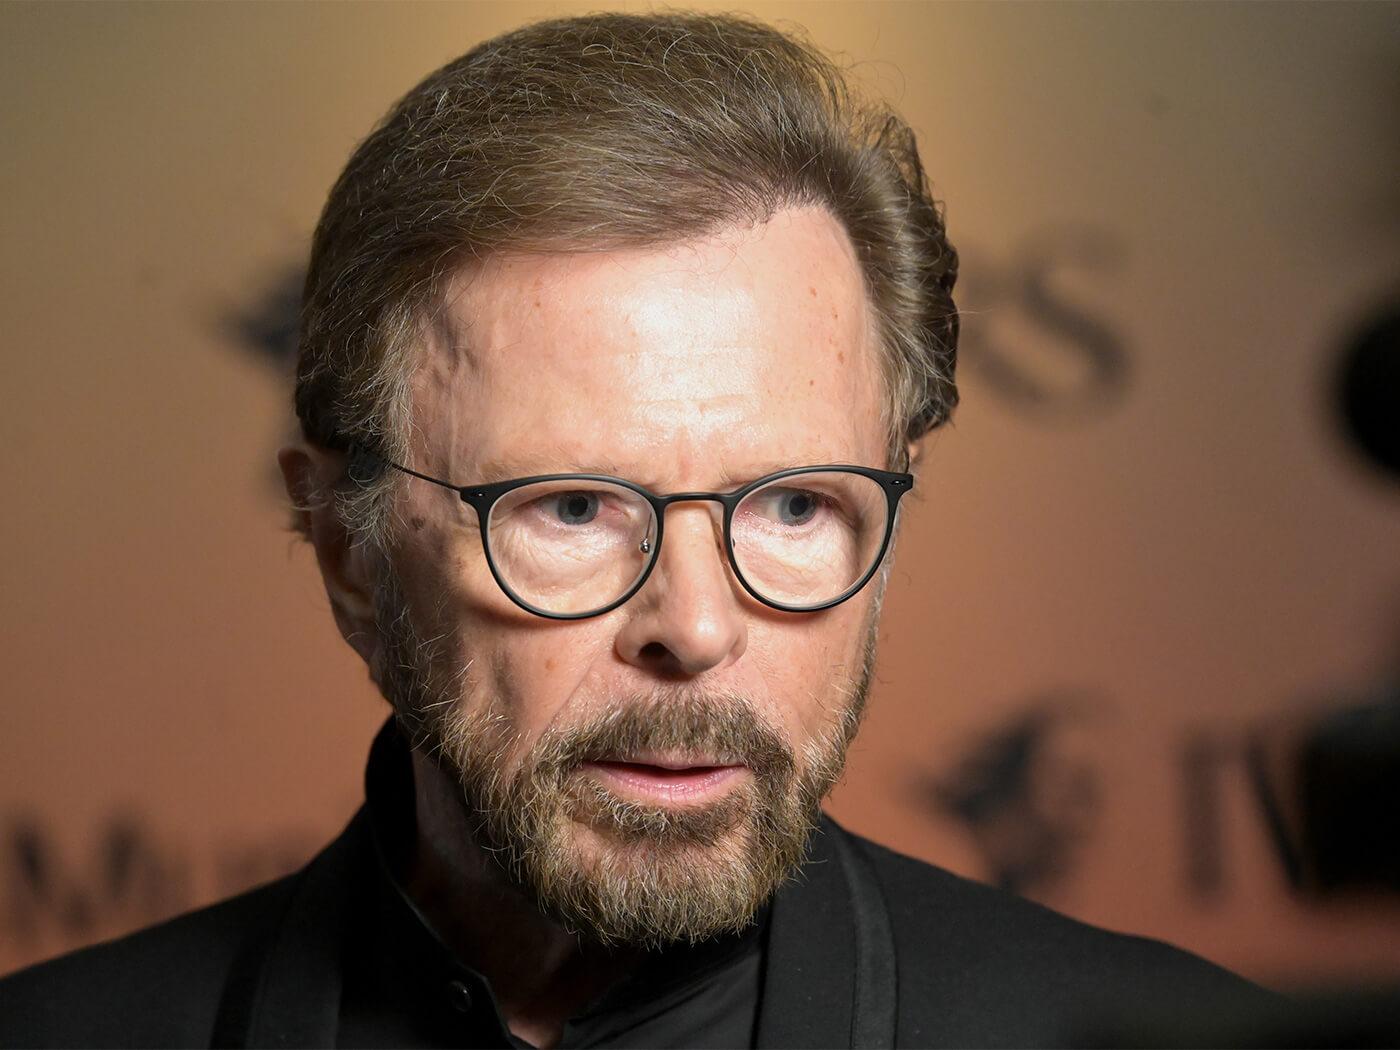 ABBA Bjorn Ulvaeus credits due